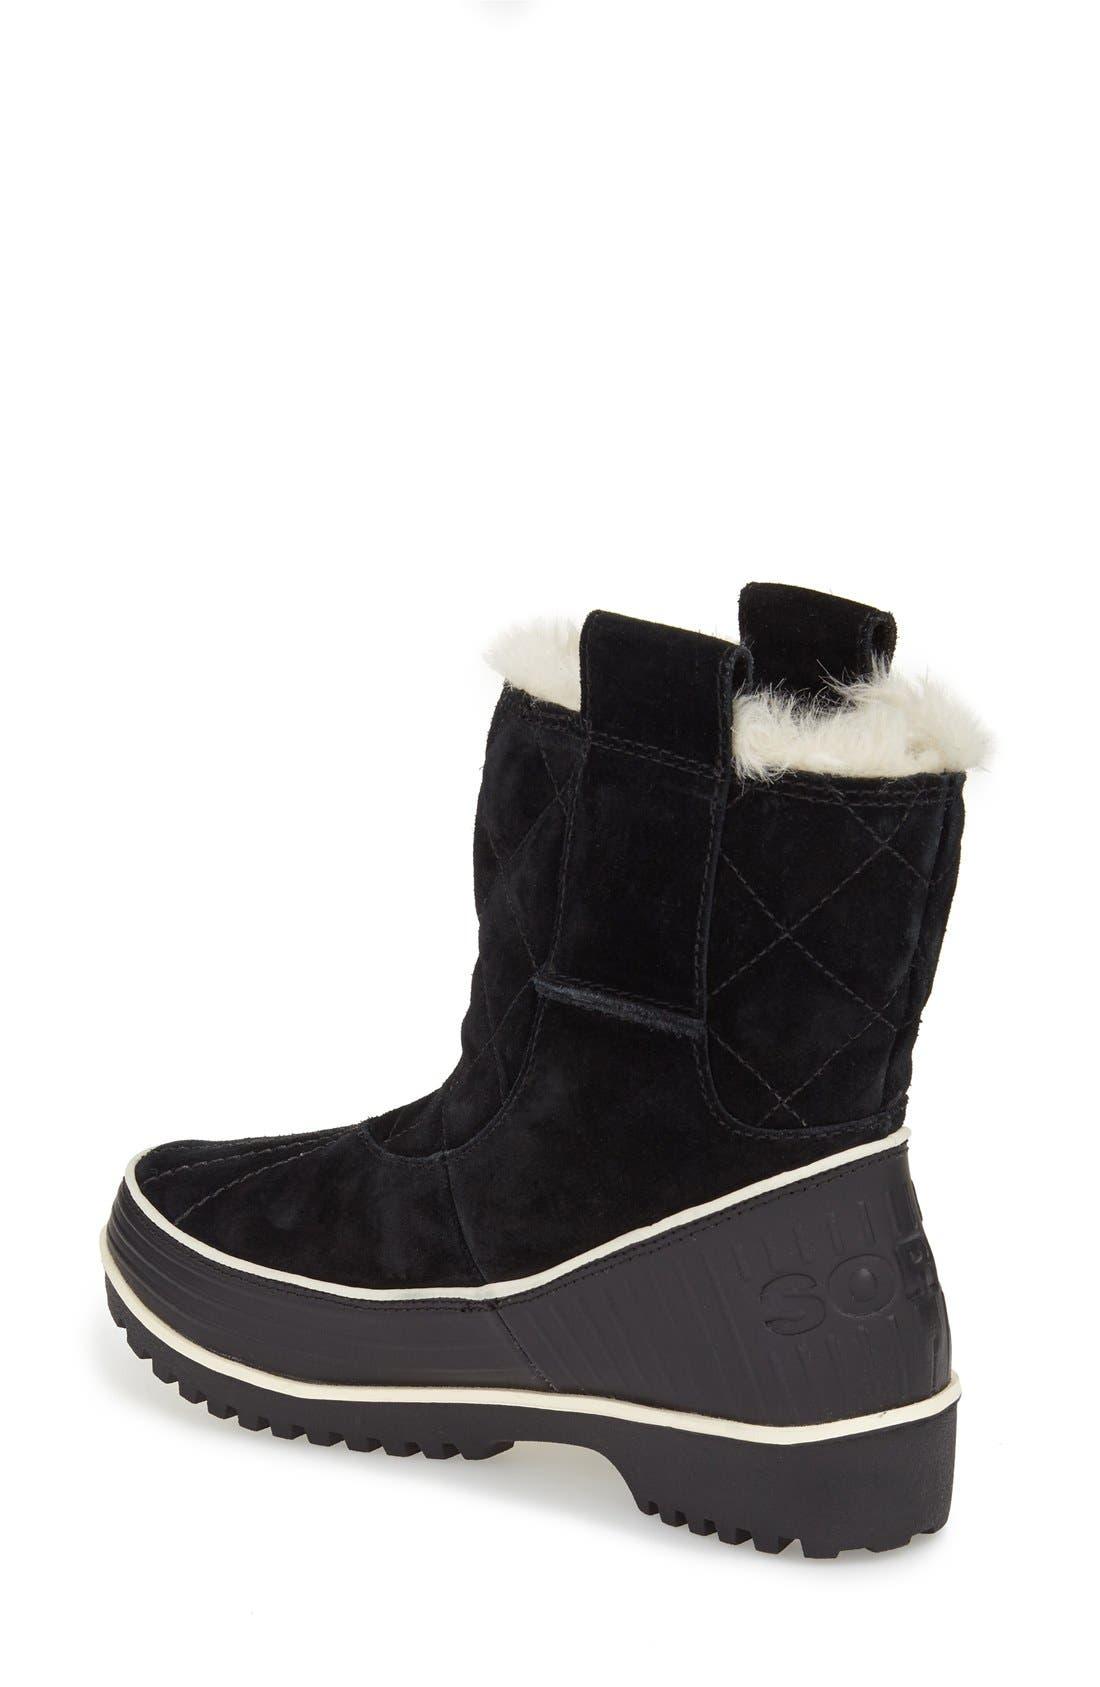 Alternate Image 2  - SOREL 'Tivoli II' Waterproof Snow Boot (Women)